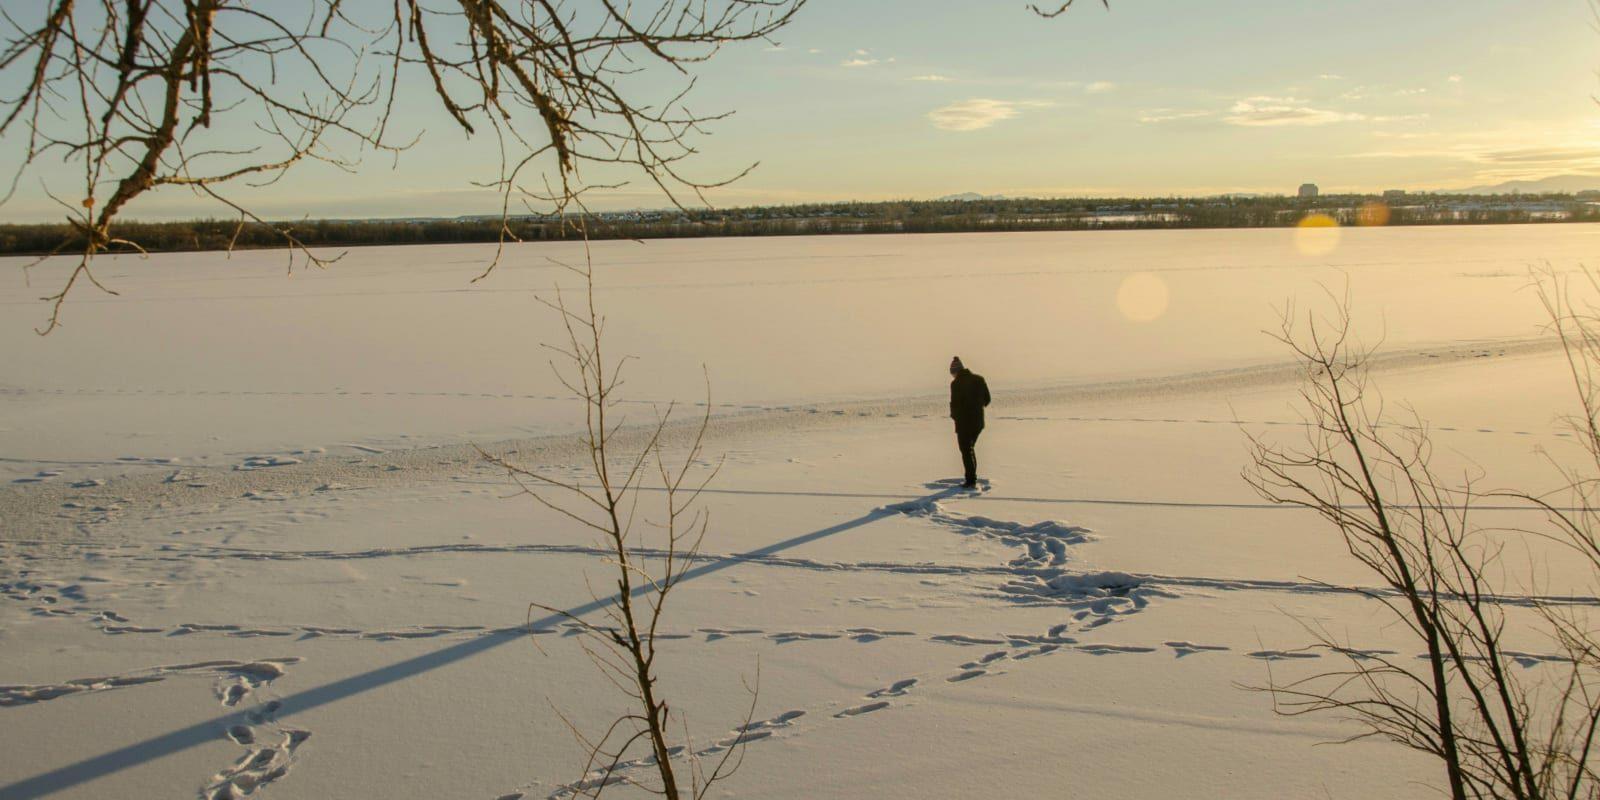 Winter Seasonal Affective Disorder Cherry Creek Lake Hiker